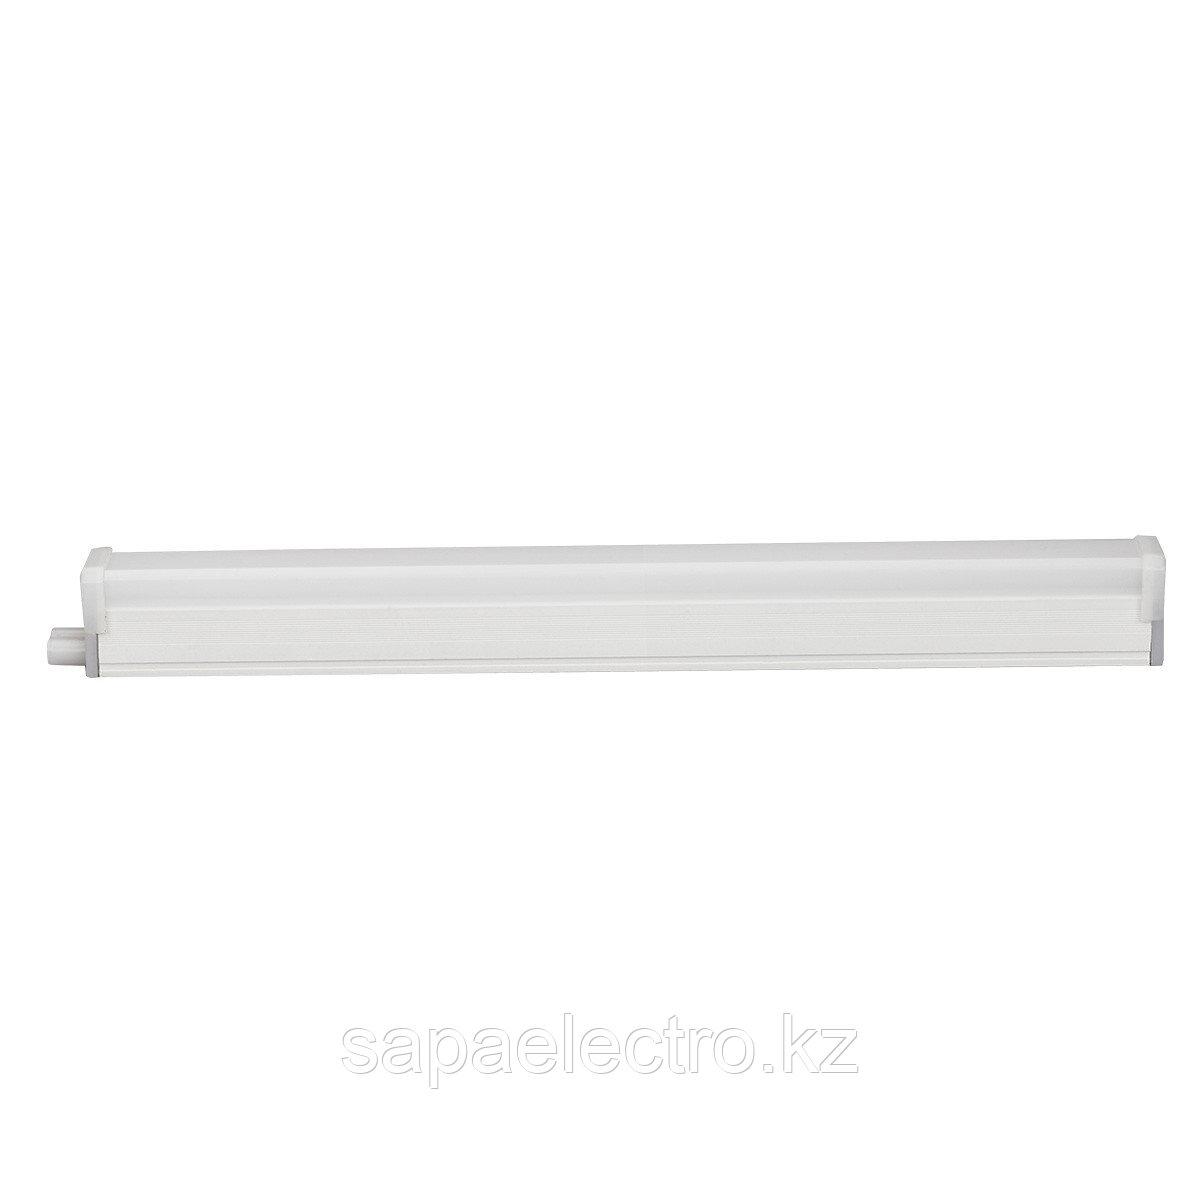 Свет-к LED  T5 5W 6500K  33sm (TEKSAN) 25шт